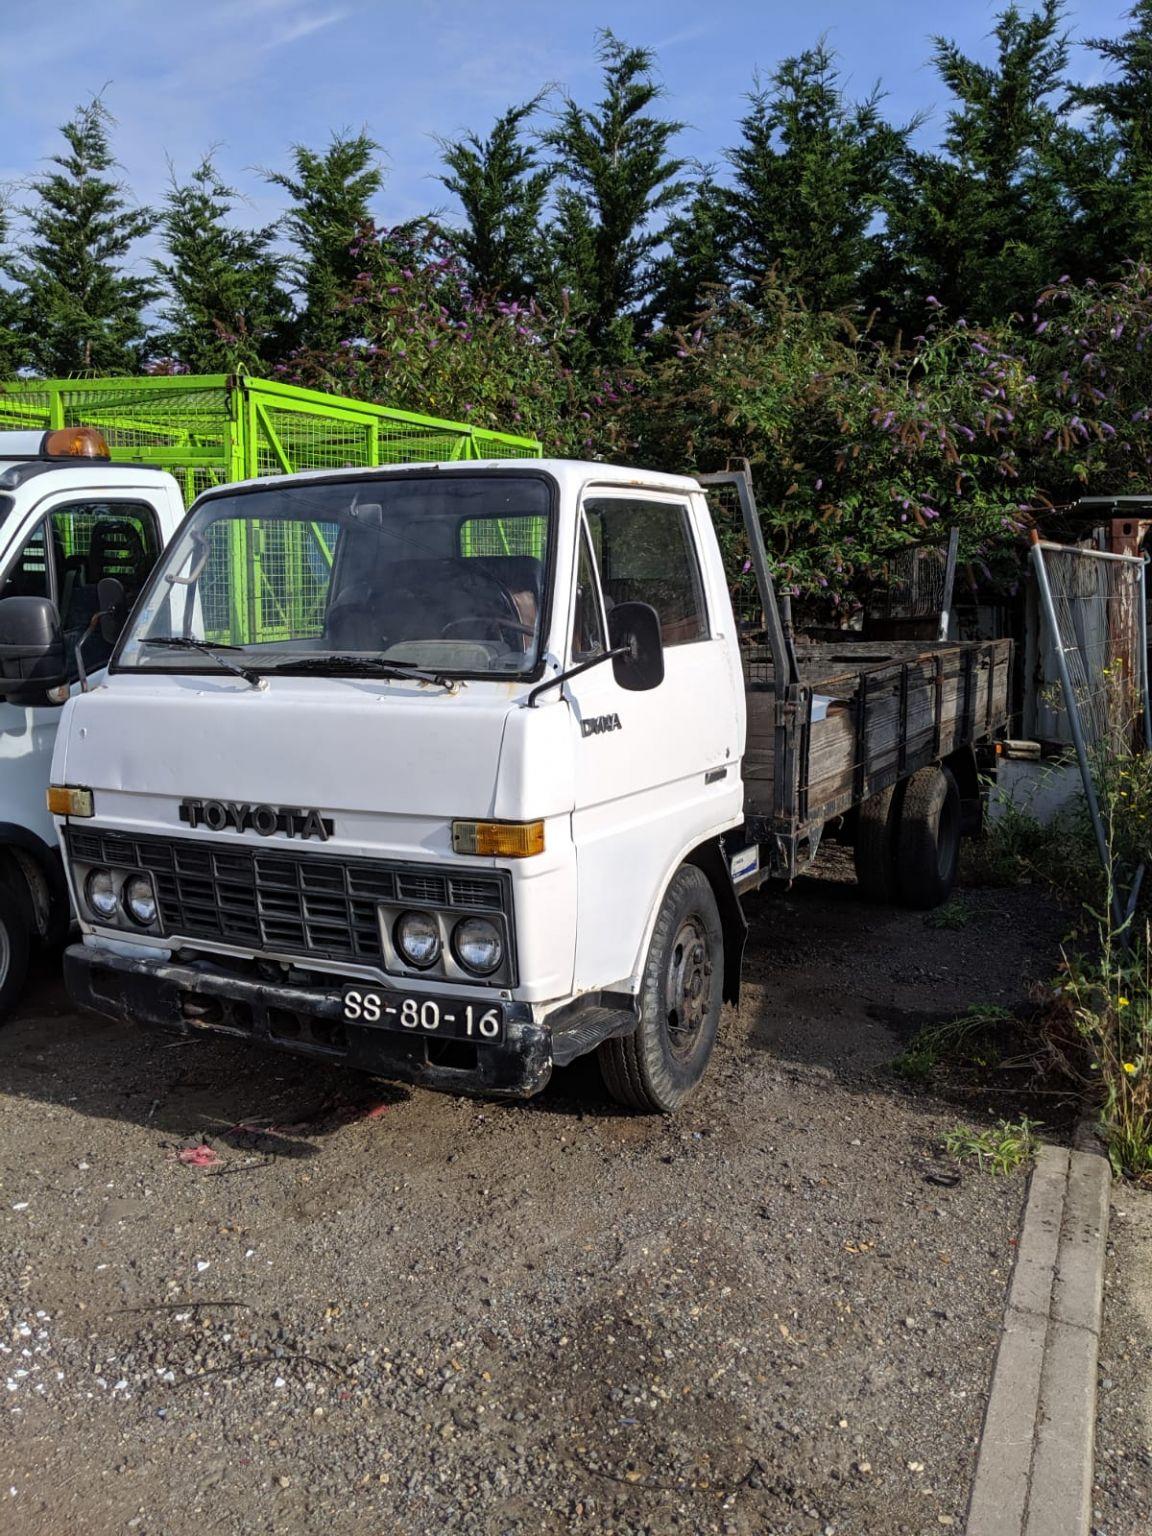 Left Hand drive, Toyota Dyna 300 / BU30 Dropside truck 3000cc engine